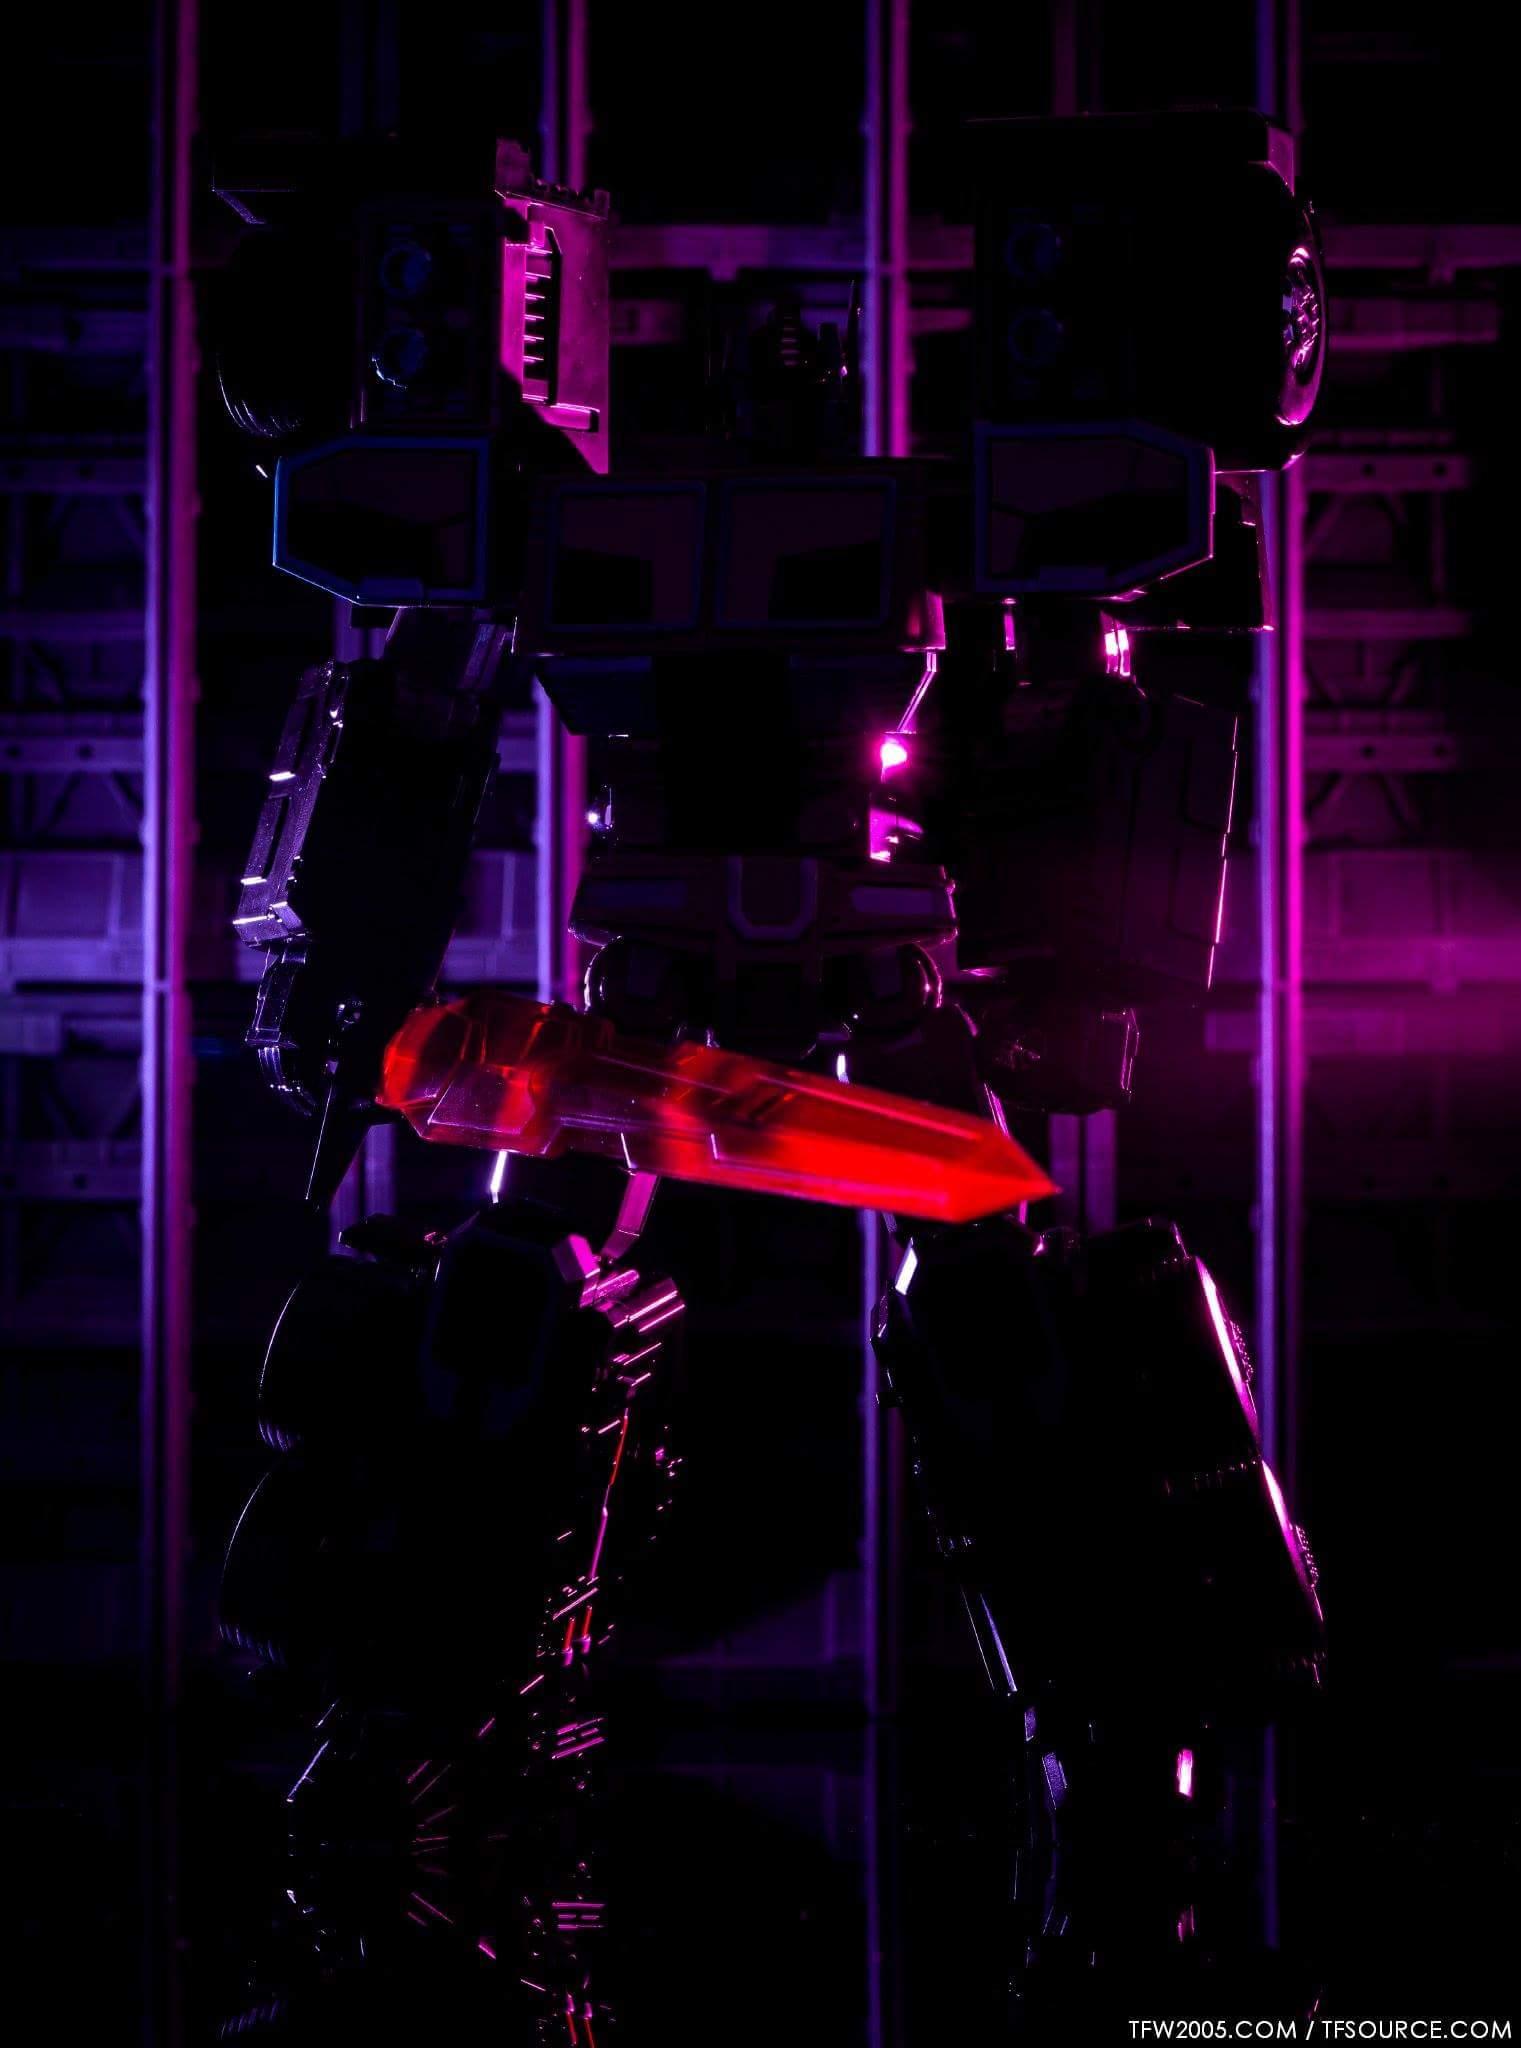 [FansHobby] Produit Tiers - Master Builder MB-01 Archenemy (aka Scourge RID 2000),  MB-04 Gunfighter II (aka Laser Optimus G2) et MB-09 Trailer (remorque) ScpdcD40